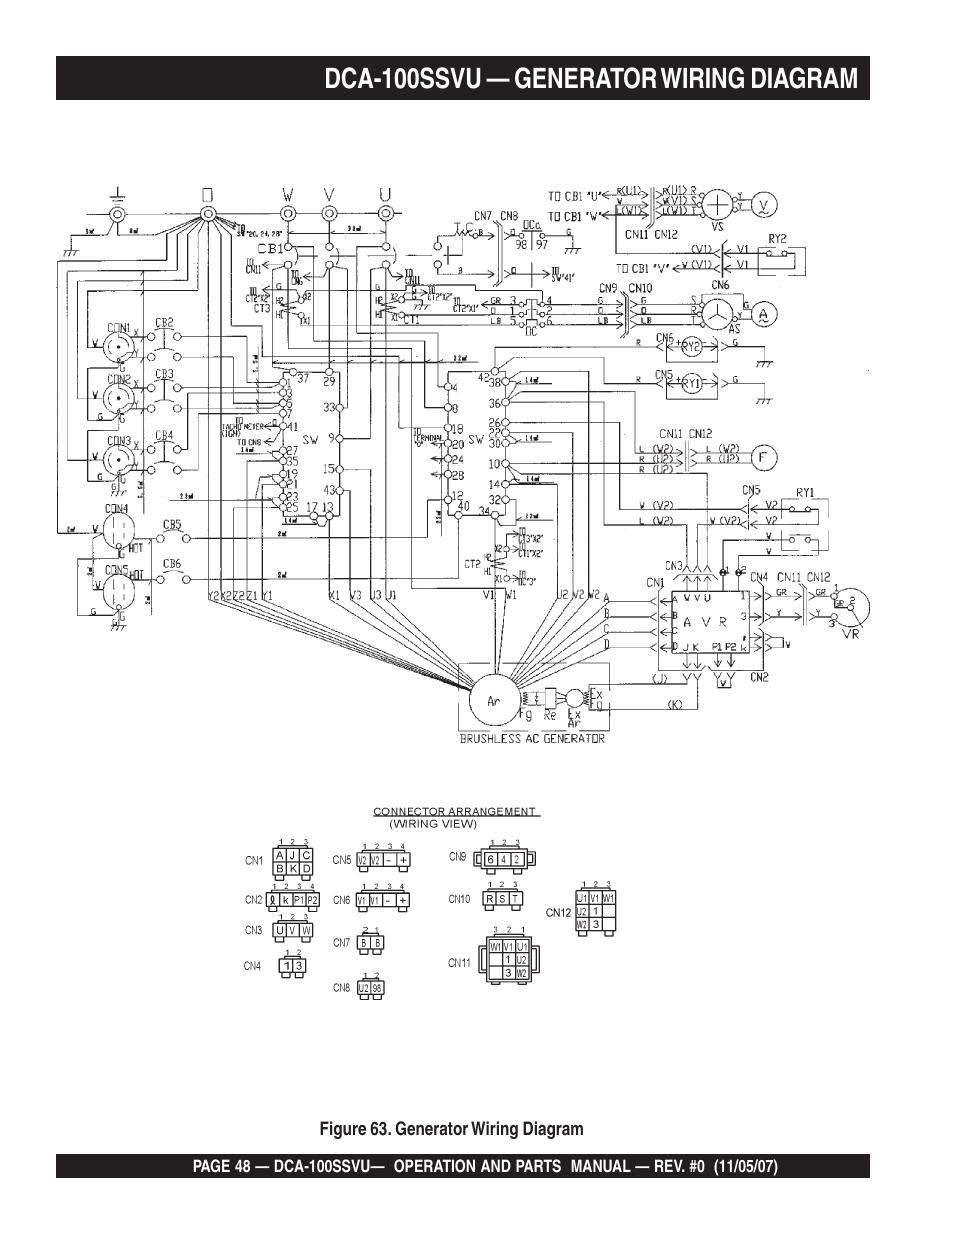 hight resolution of dca 100ssvu generator wiring diagram multiquip mq power whisperwatt 60 hz generator dca